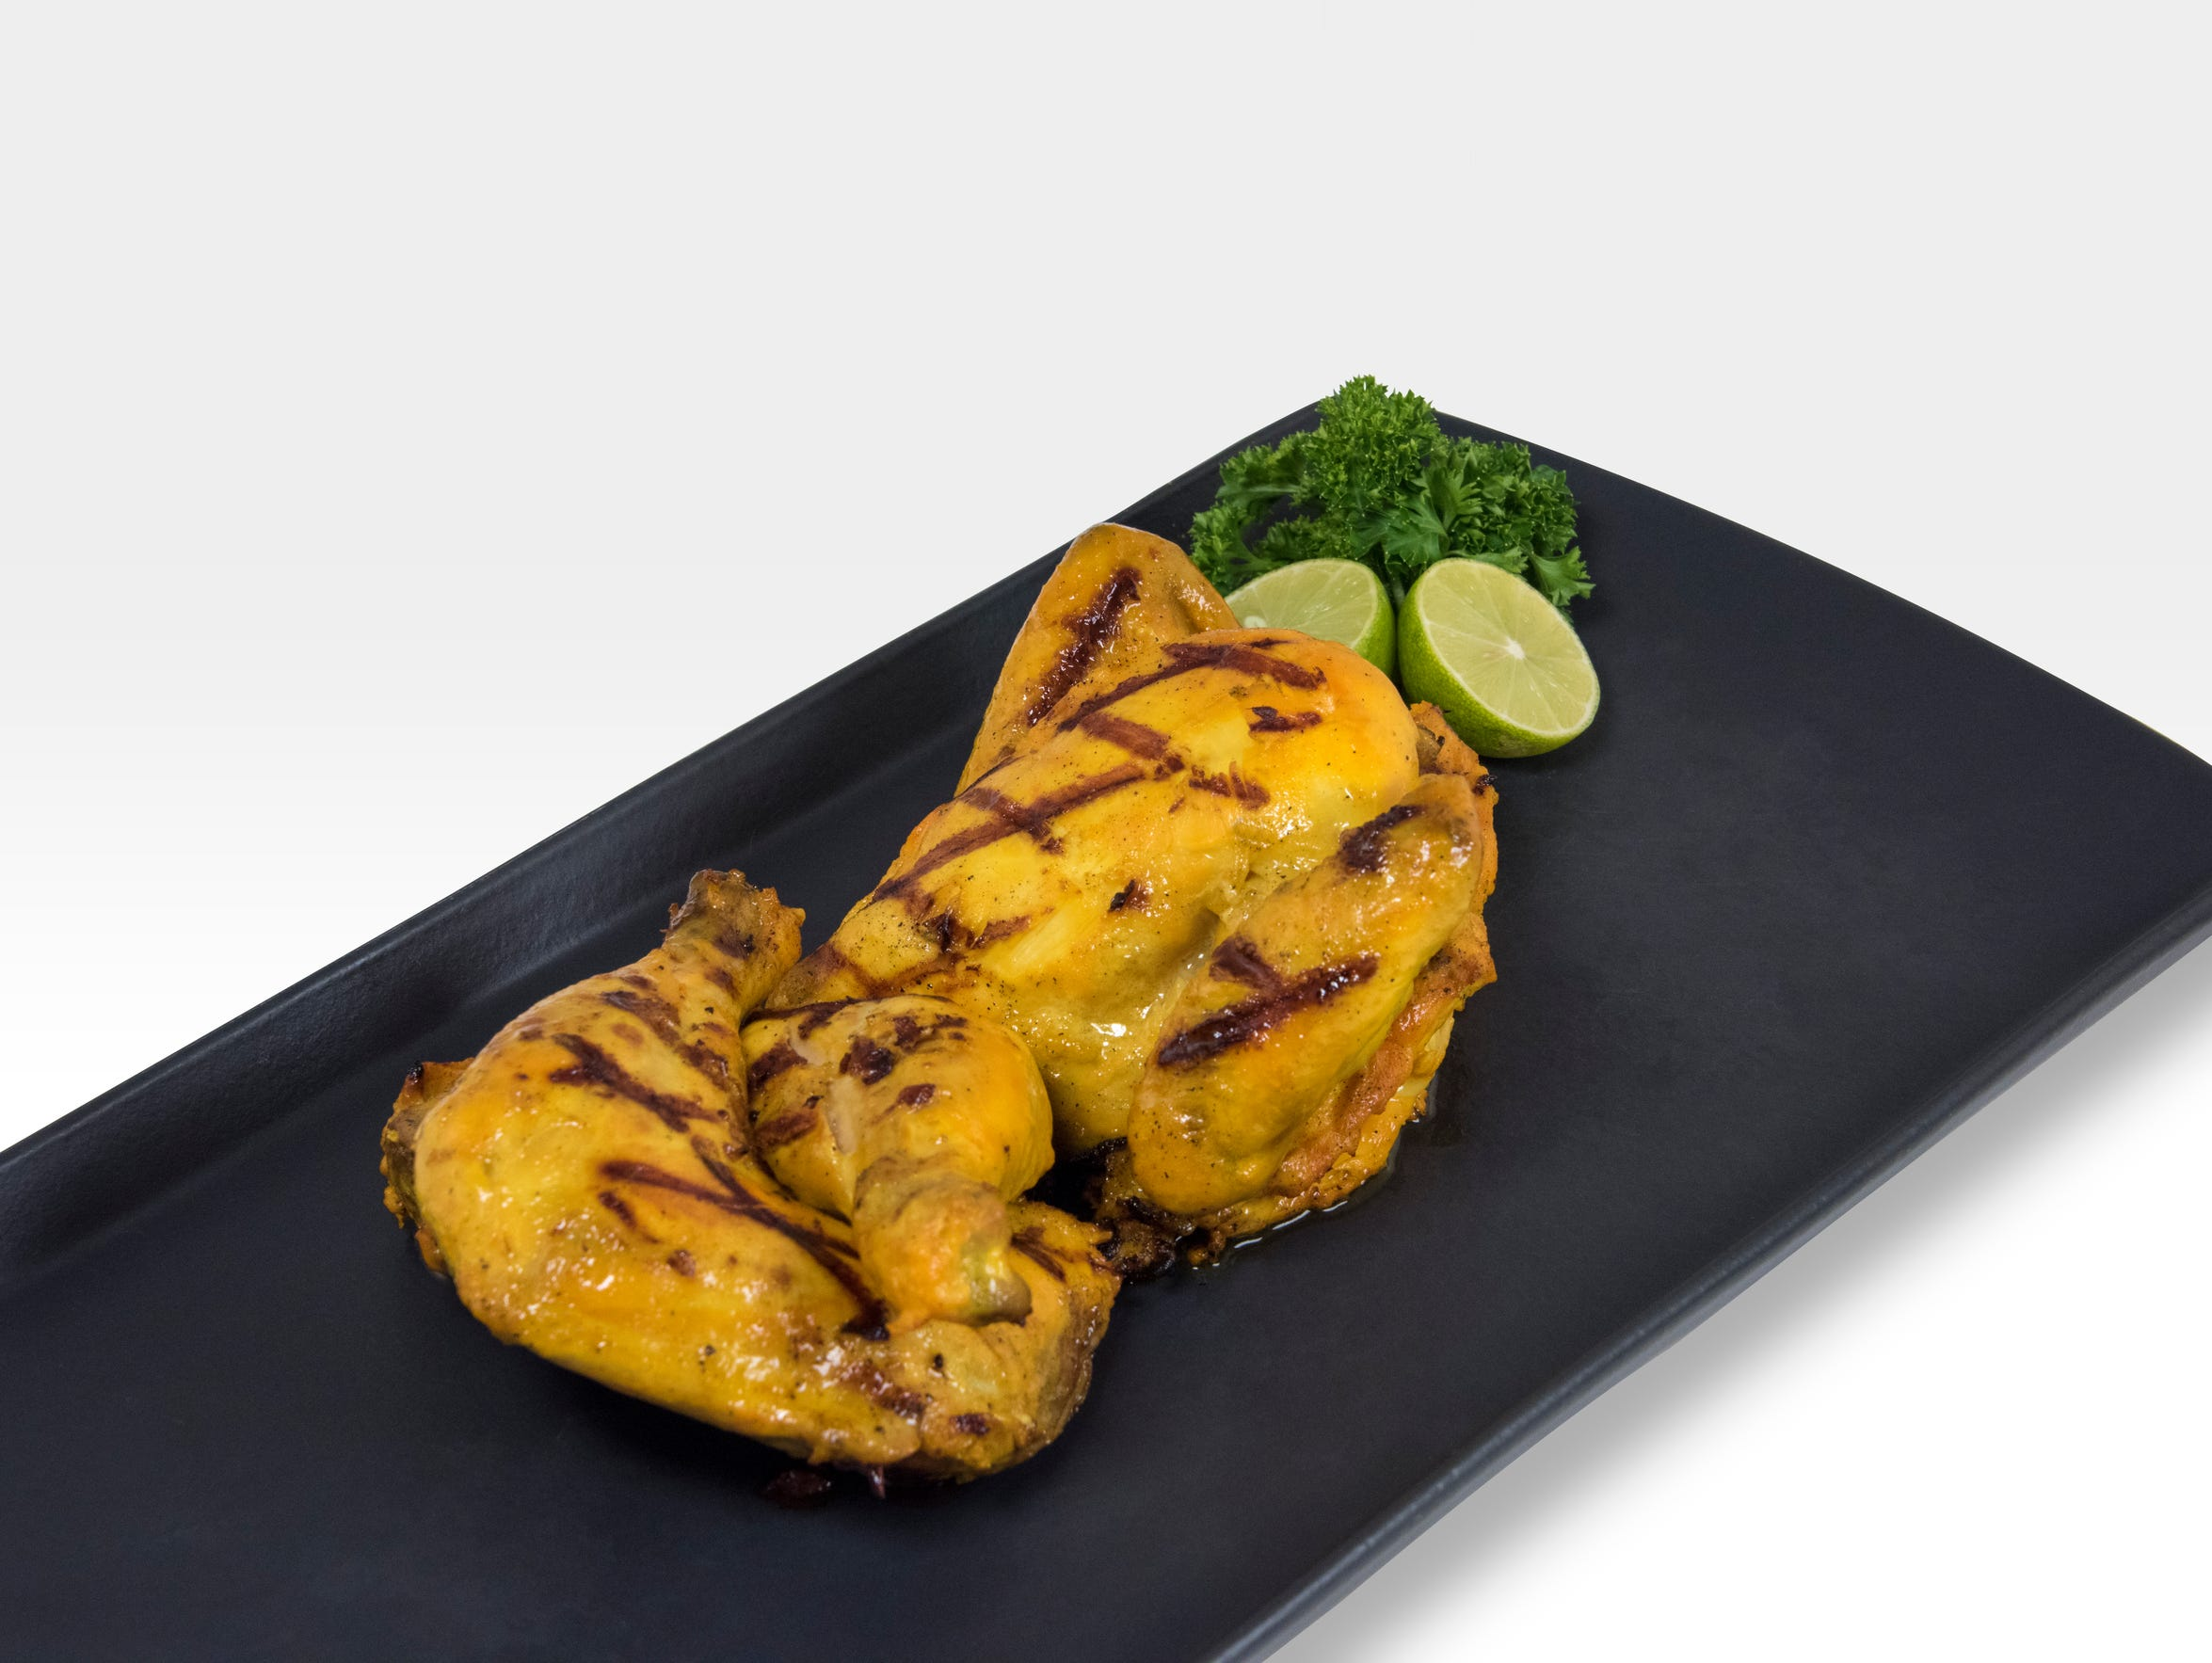 Precious saffron ranks among the essential spices of